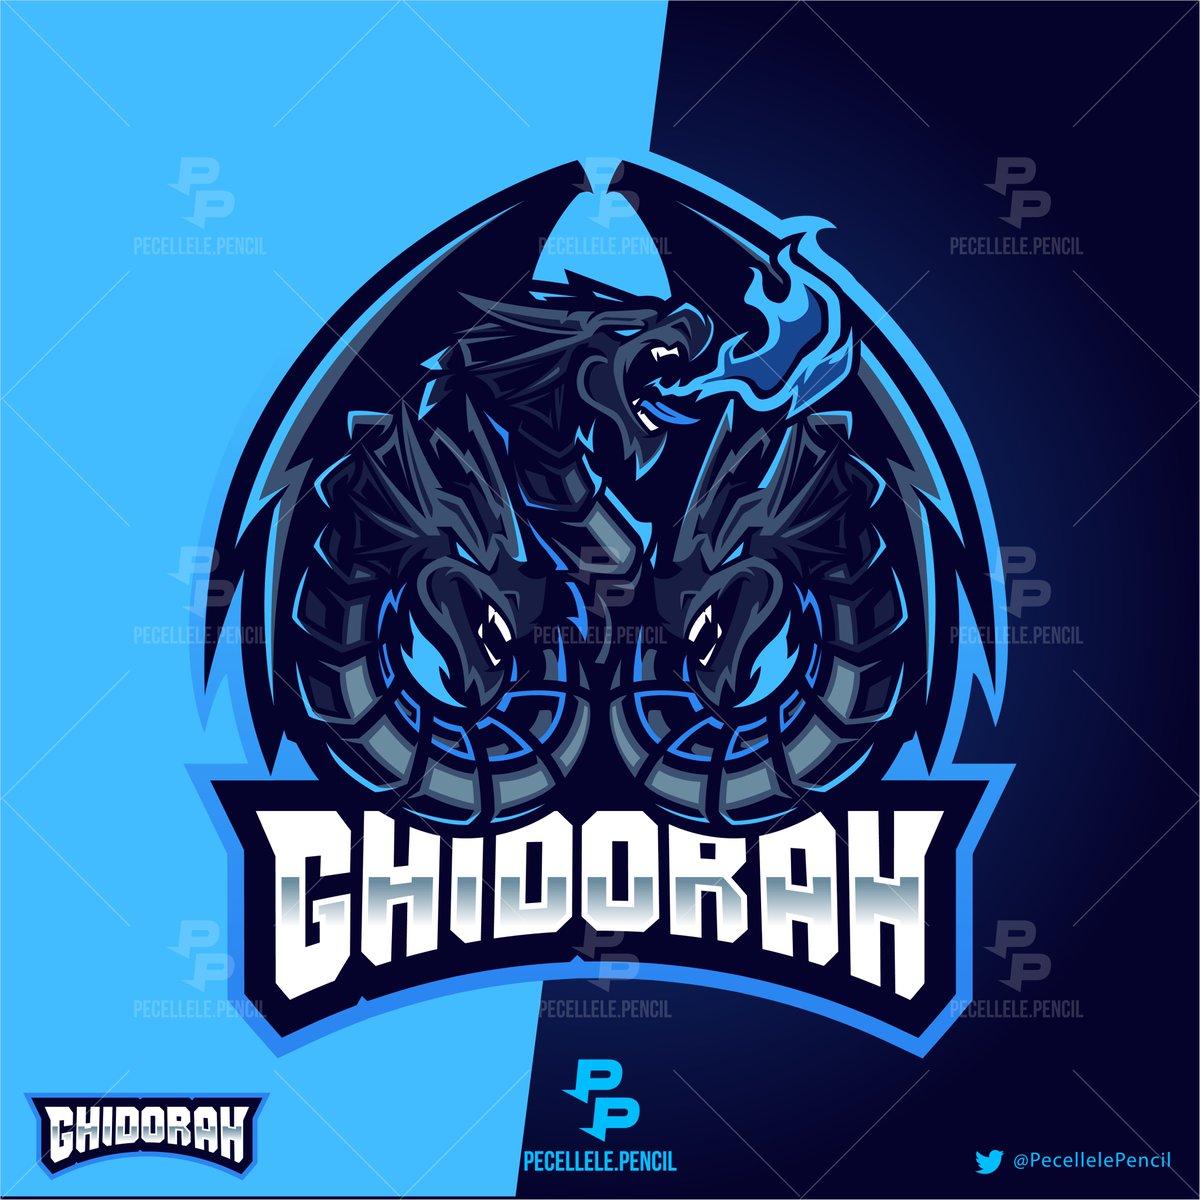 recent logo i did for a client. hire me if you need a logo design.  @DynoRTs @Demented_RTs @SGH_RTs @GFXCoach @IconRTs @Agile_RTs @GamerGalsRT @PromoteGamers @BlazedRTs @DripRT @TwitchTVOnline  #dragonlogo #esportlogo #esports #gaminglogo #mascotlogo #ghidorah #squadlogo pic.twitter.com/gFHqZR0zOV